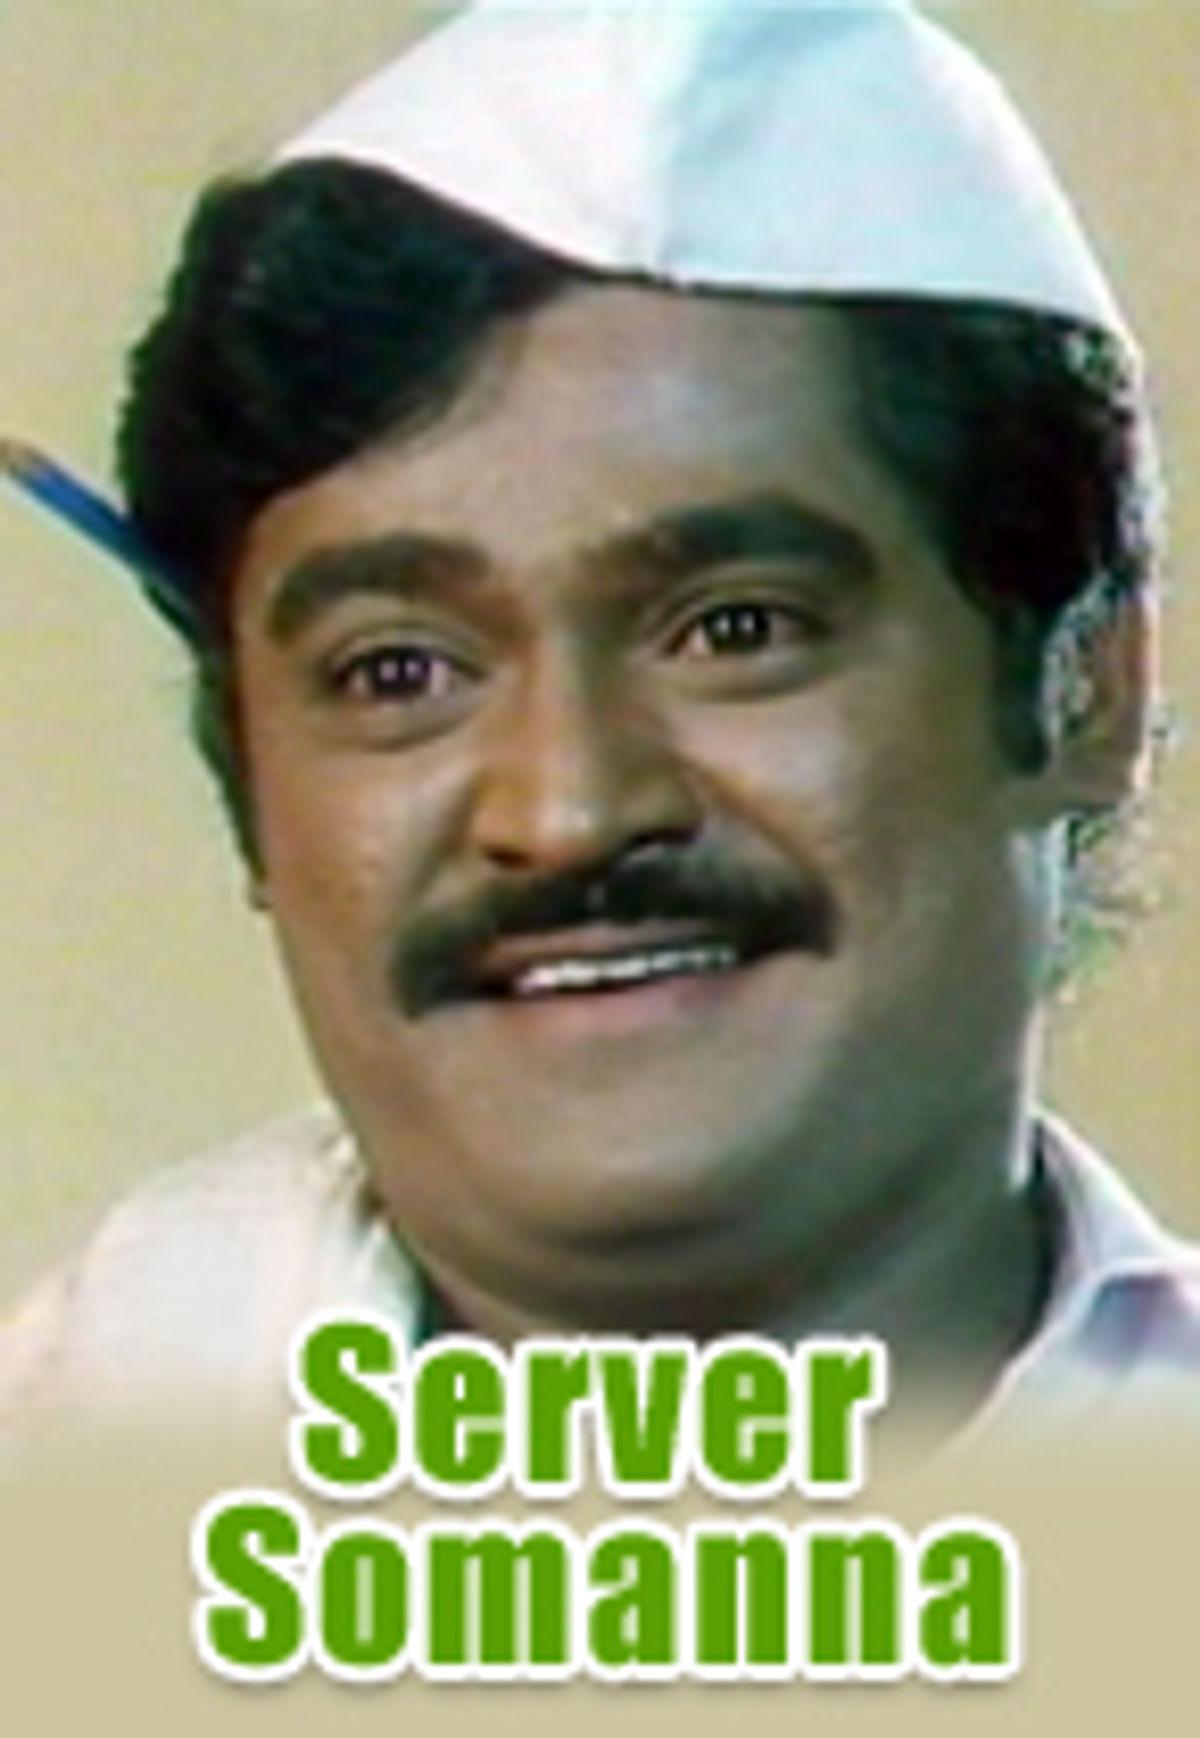 Server Somanna